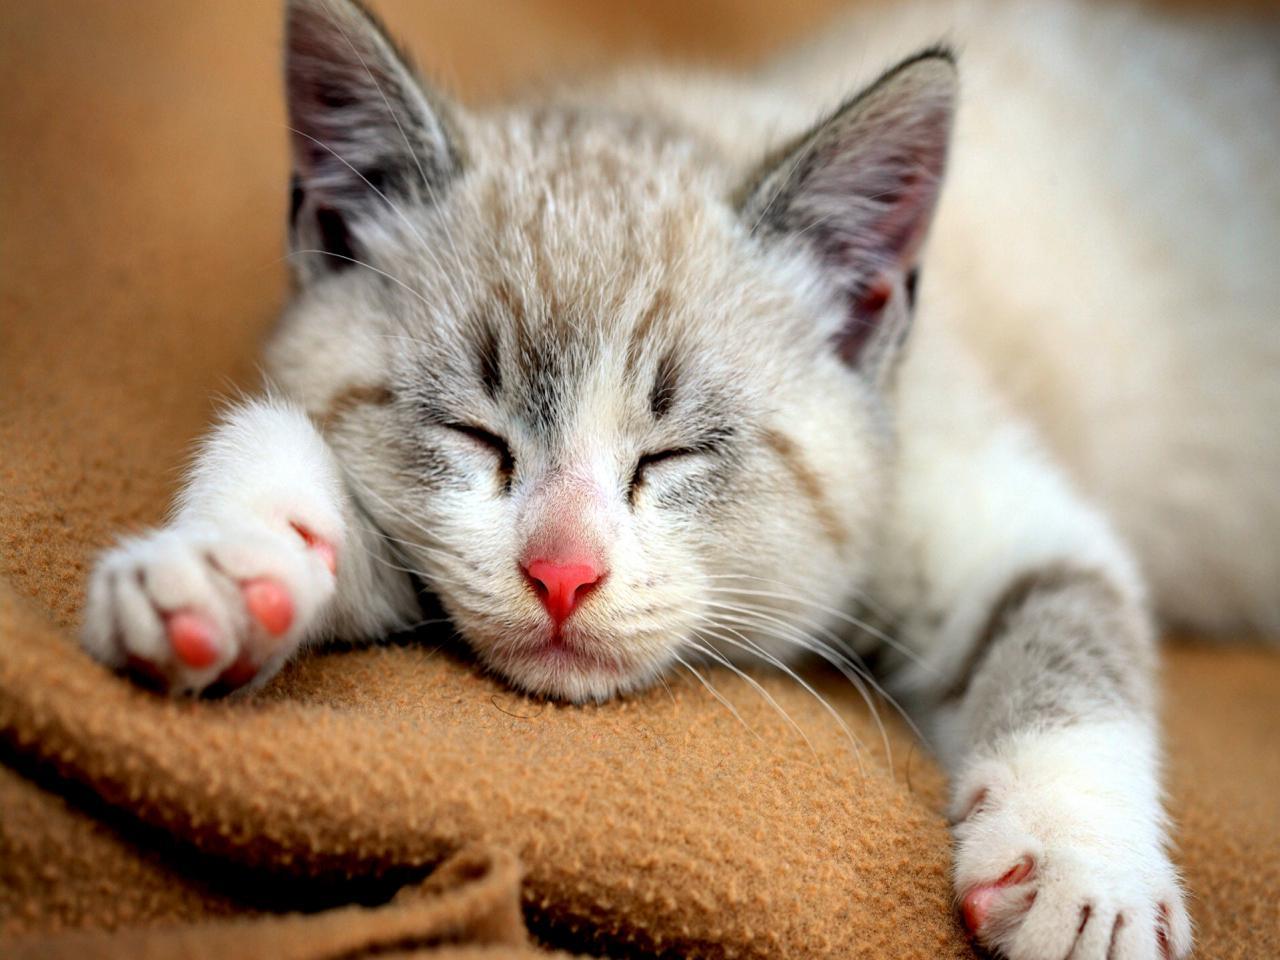 Androidcats игры с котами, кошками, котятами, мой том на андроид.